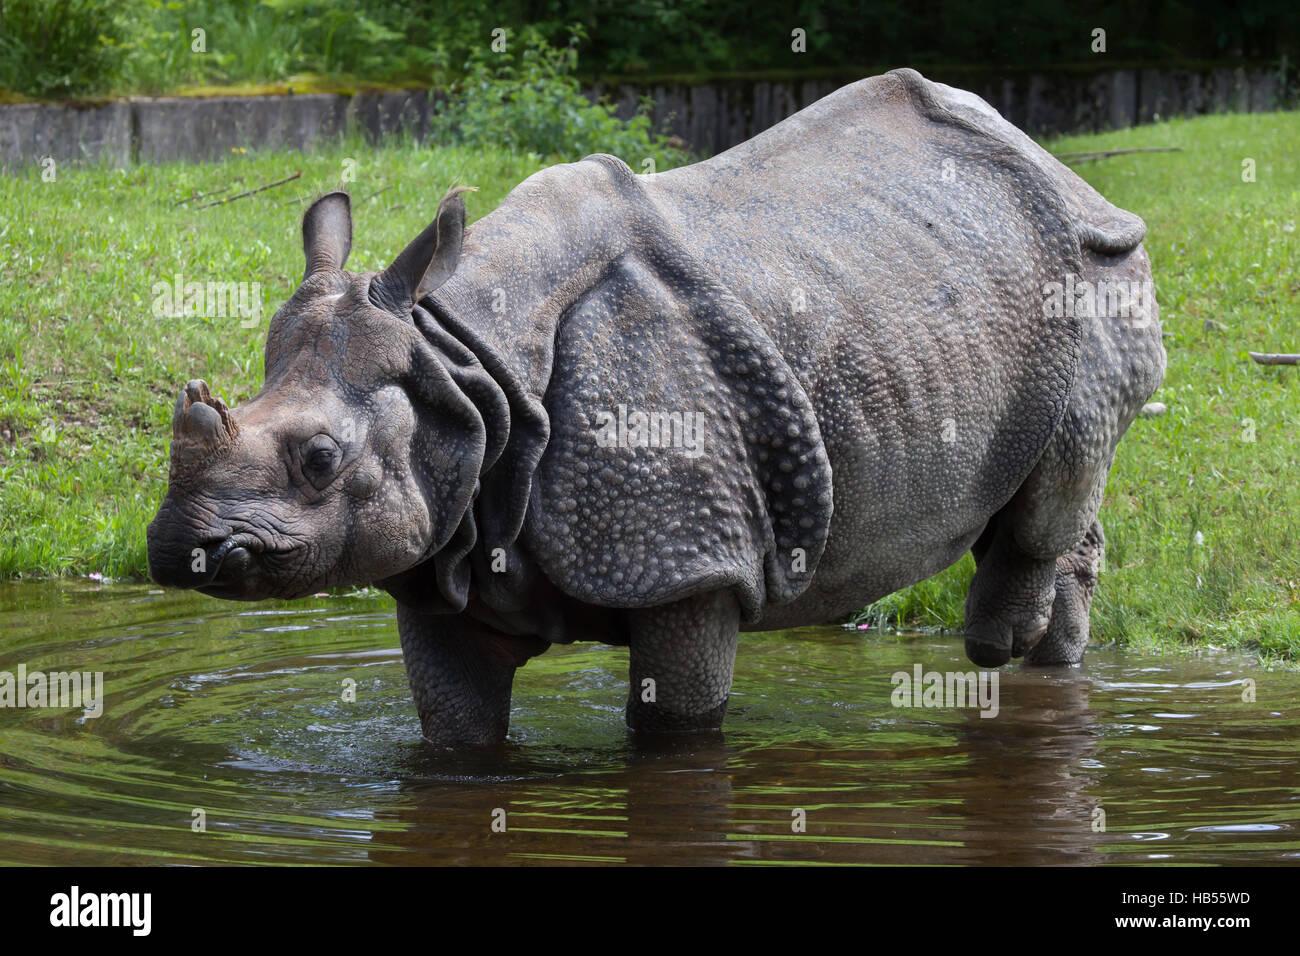 Indian rhinoceros (Rhinoceros unicornis). Wildlife animal. - Stock Image